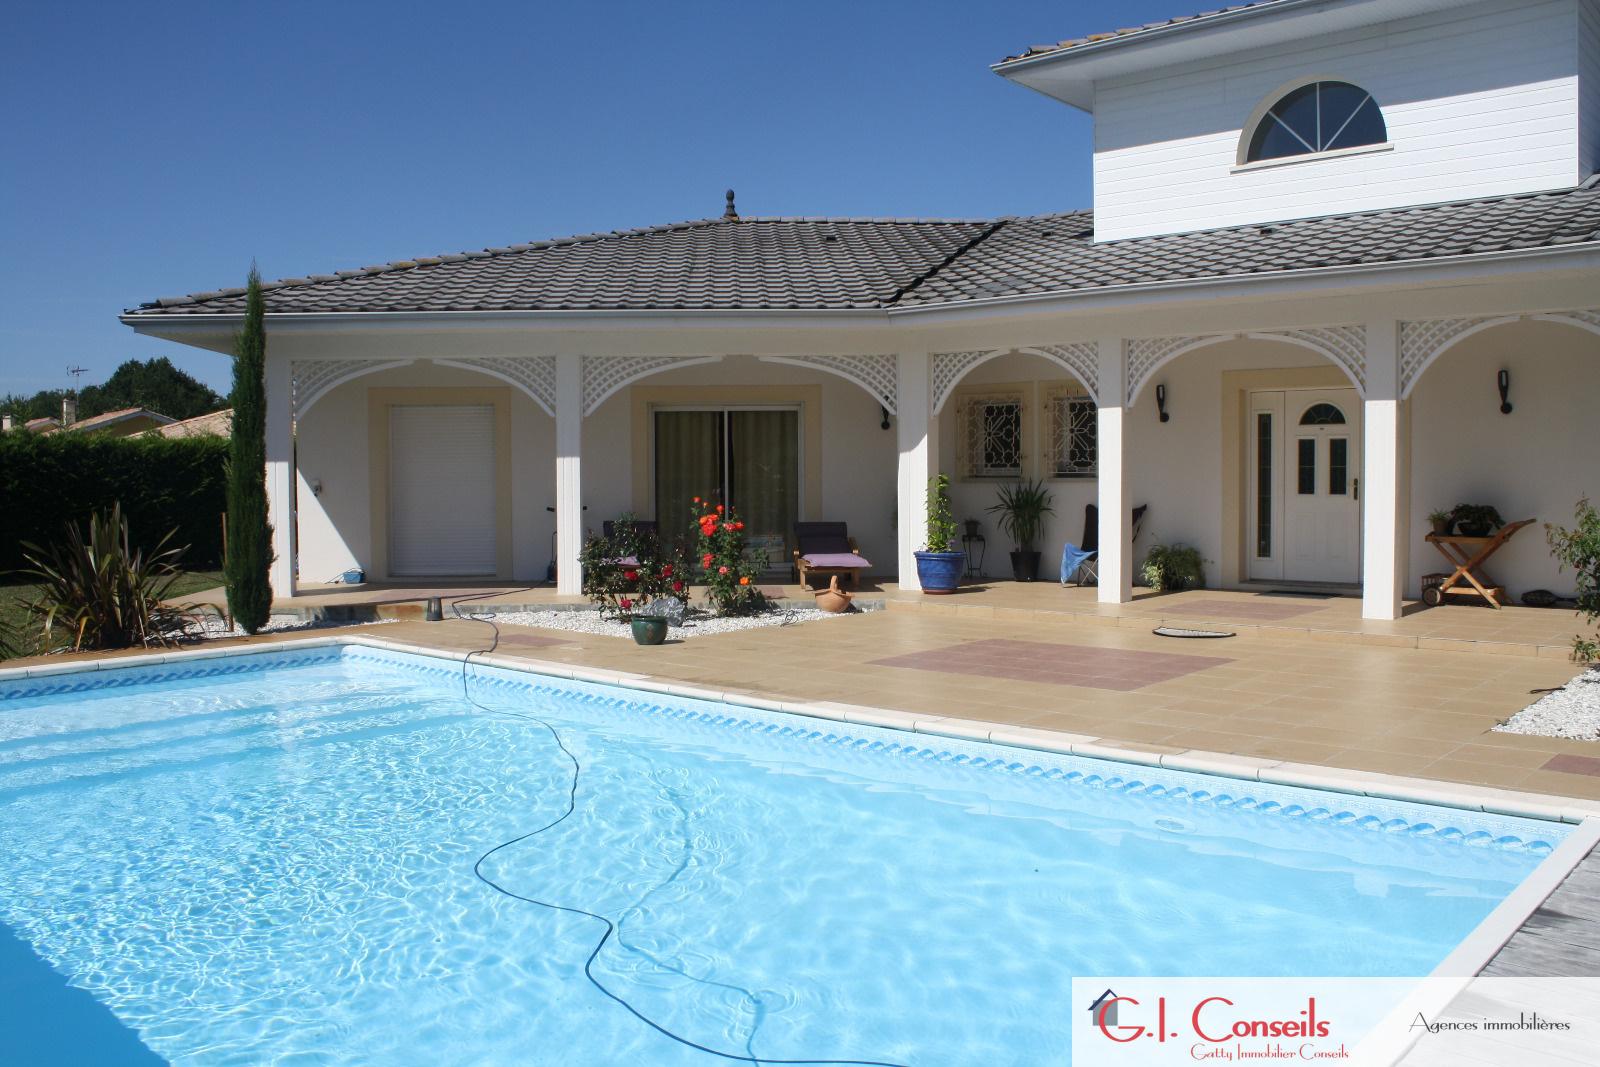 Vente andernos contemporaine de 4 chambres et piscine for Piscine andernos